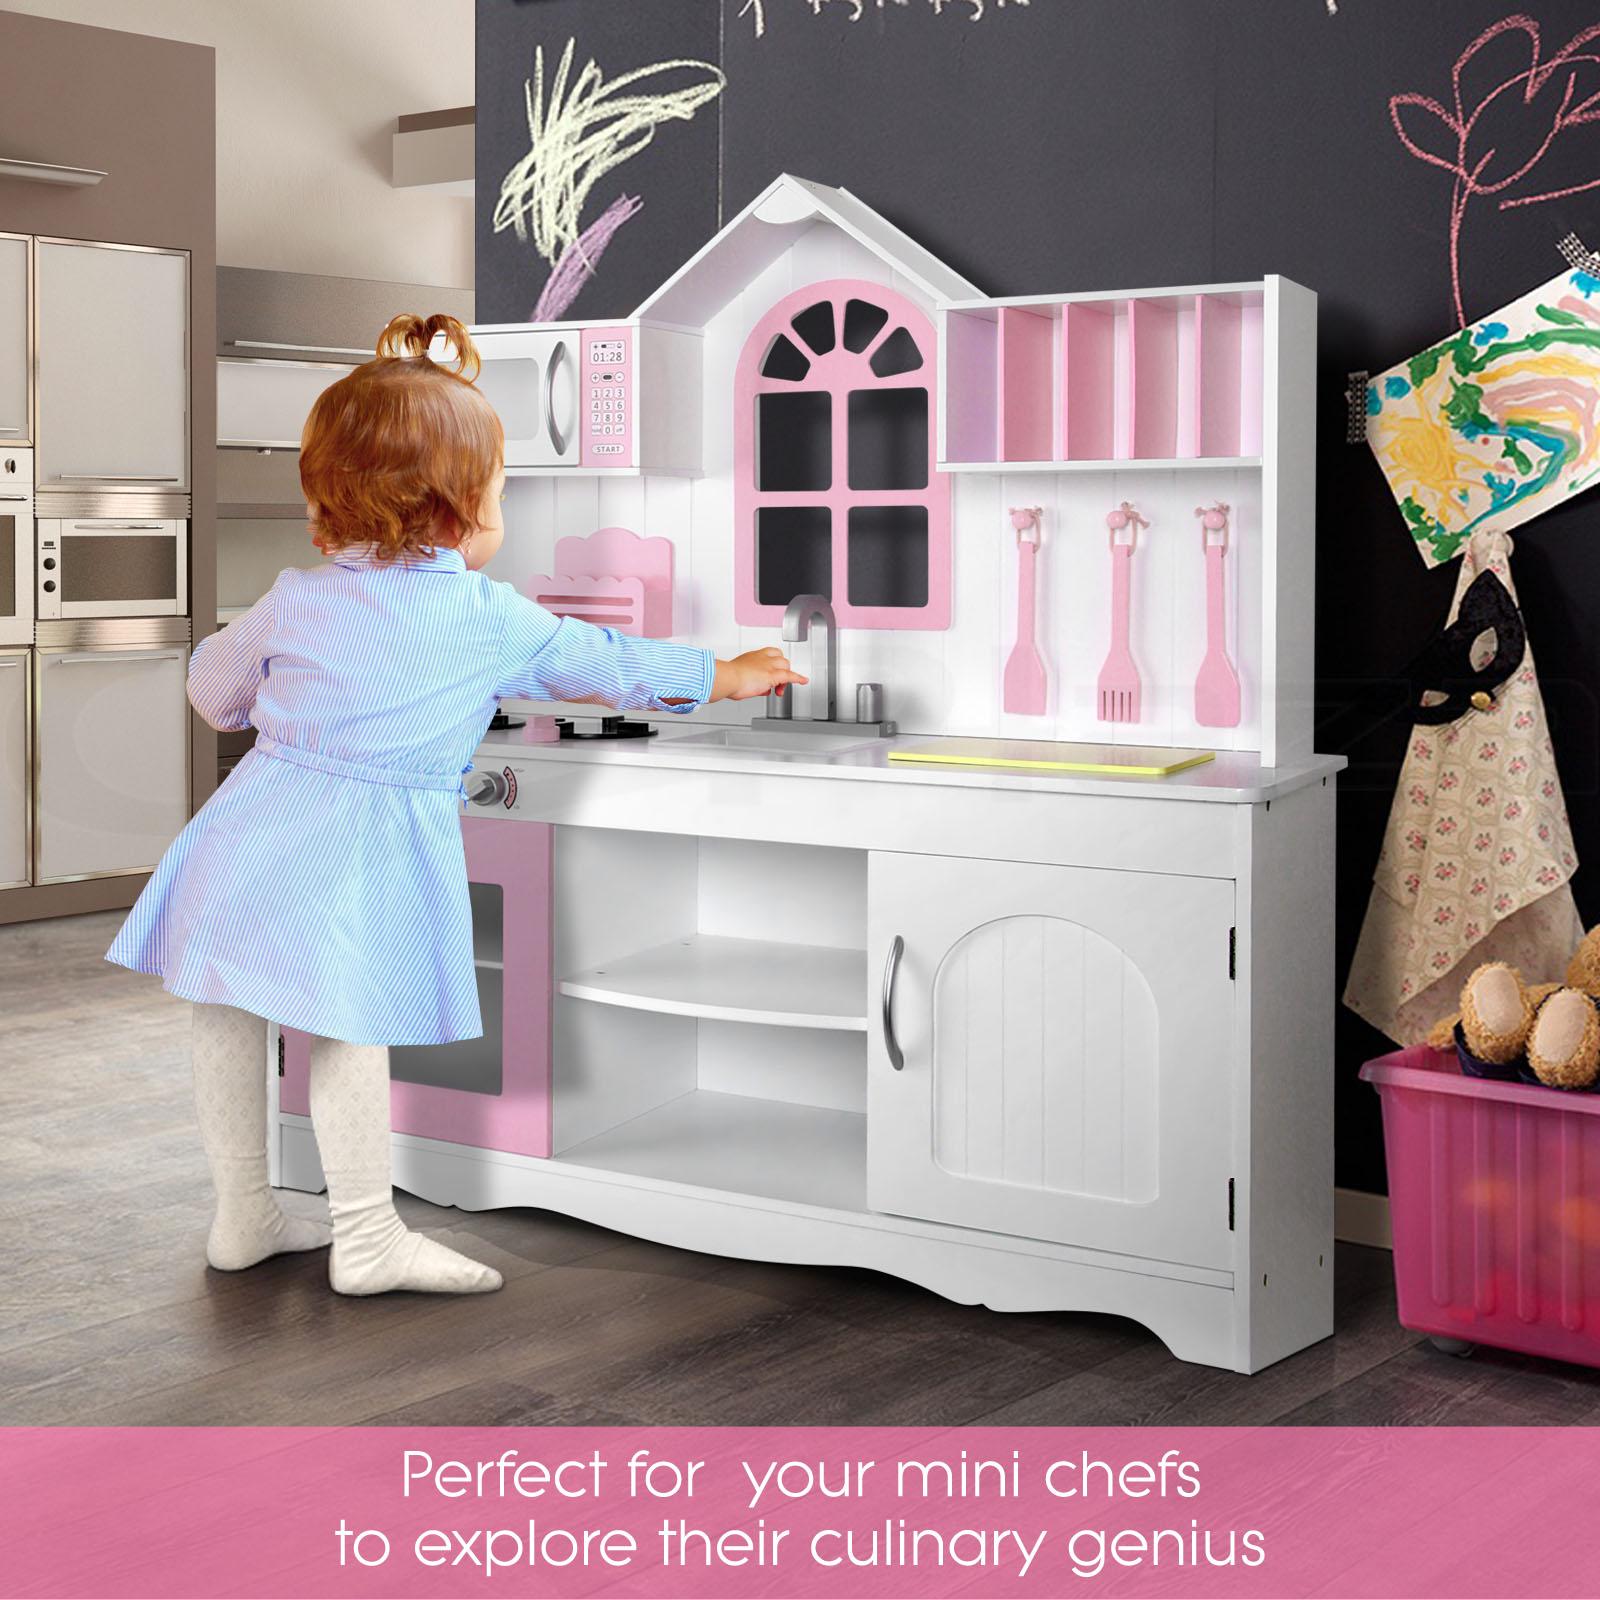 kids wooden pretend play kitchen set toy toddlers market home  - kidswoodenpretendplaykitchensettoytoddlers